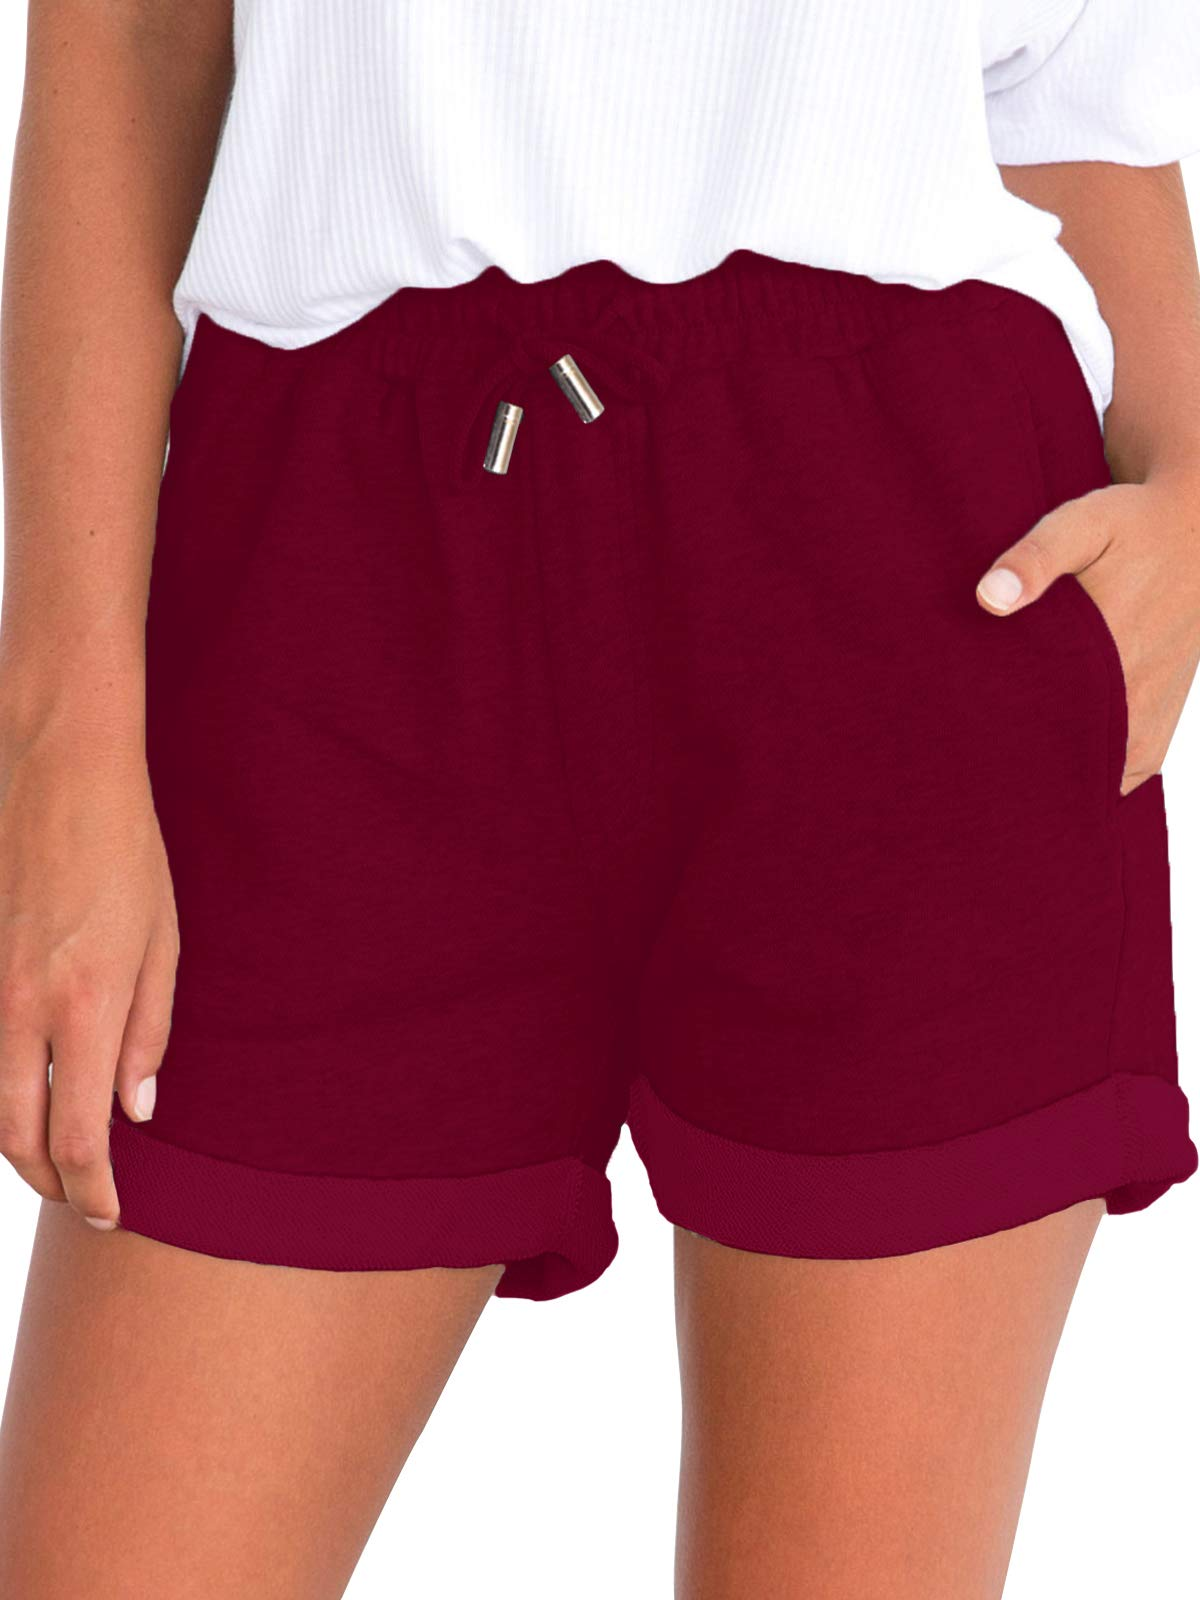 Govc Women's Juniors Shorts Casual Summer Elastic Waist Beach Shorts with Drawstring(Burgundy,S)